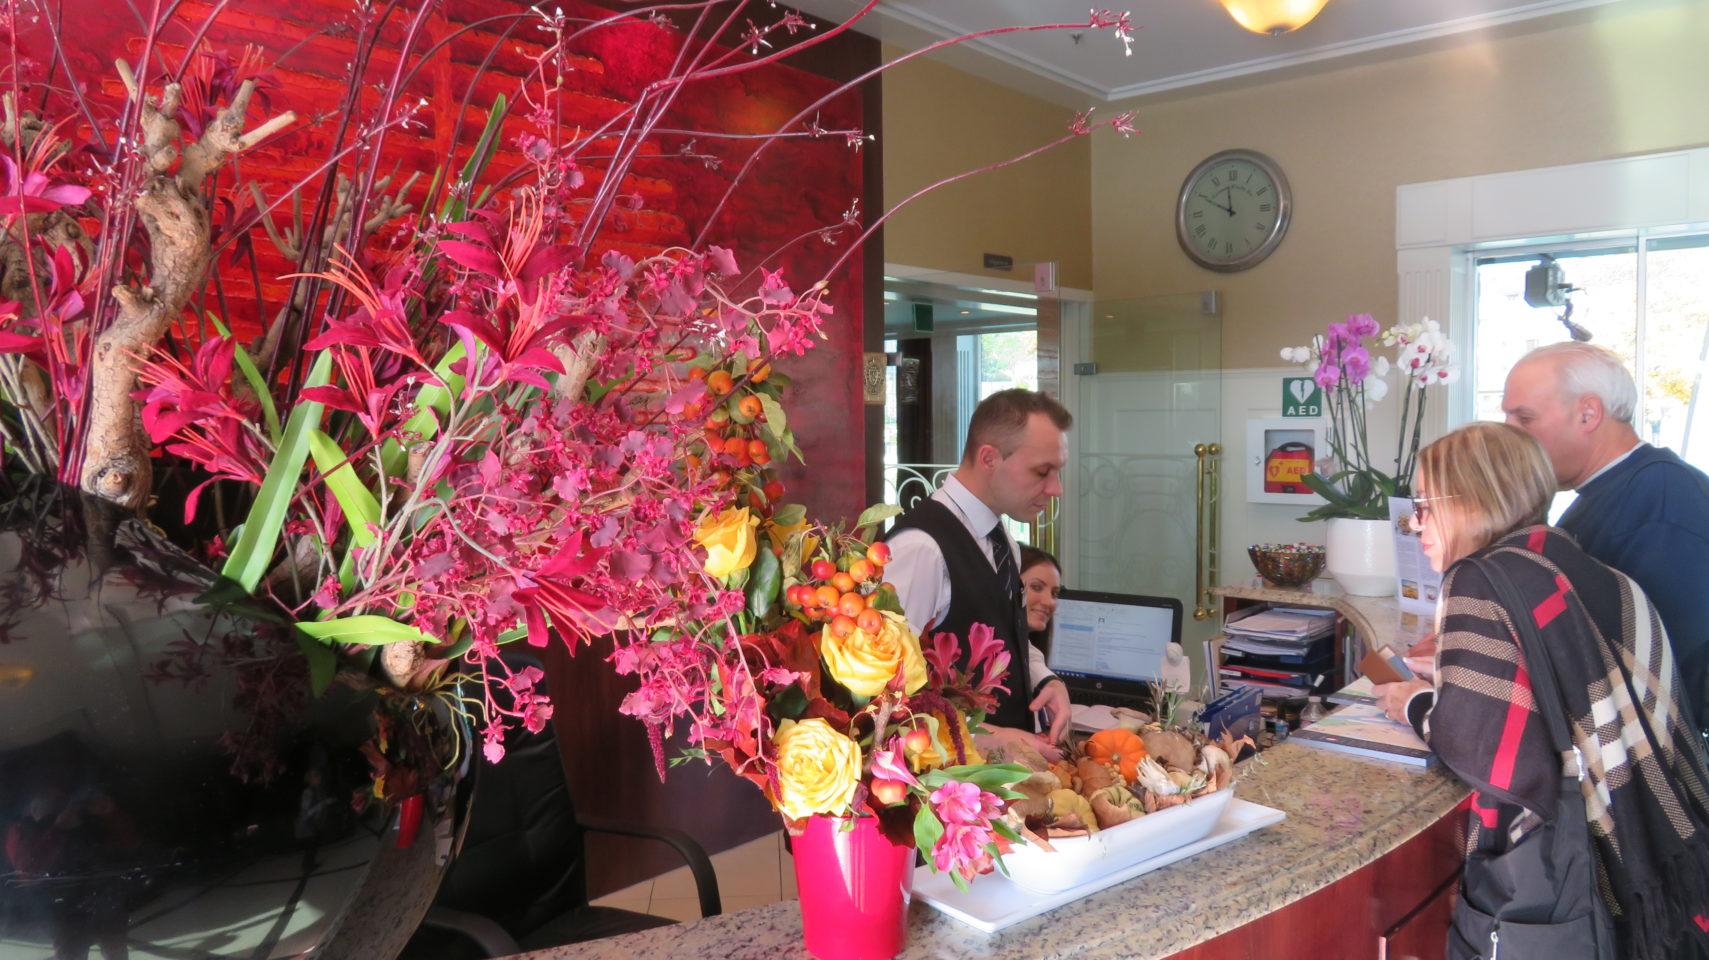 Staffed round the clock, the Reception Desk of AMALegro (Paris and Normandie AMAWaterways Cruise)